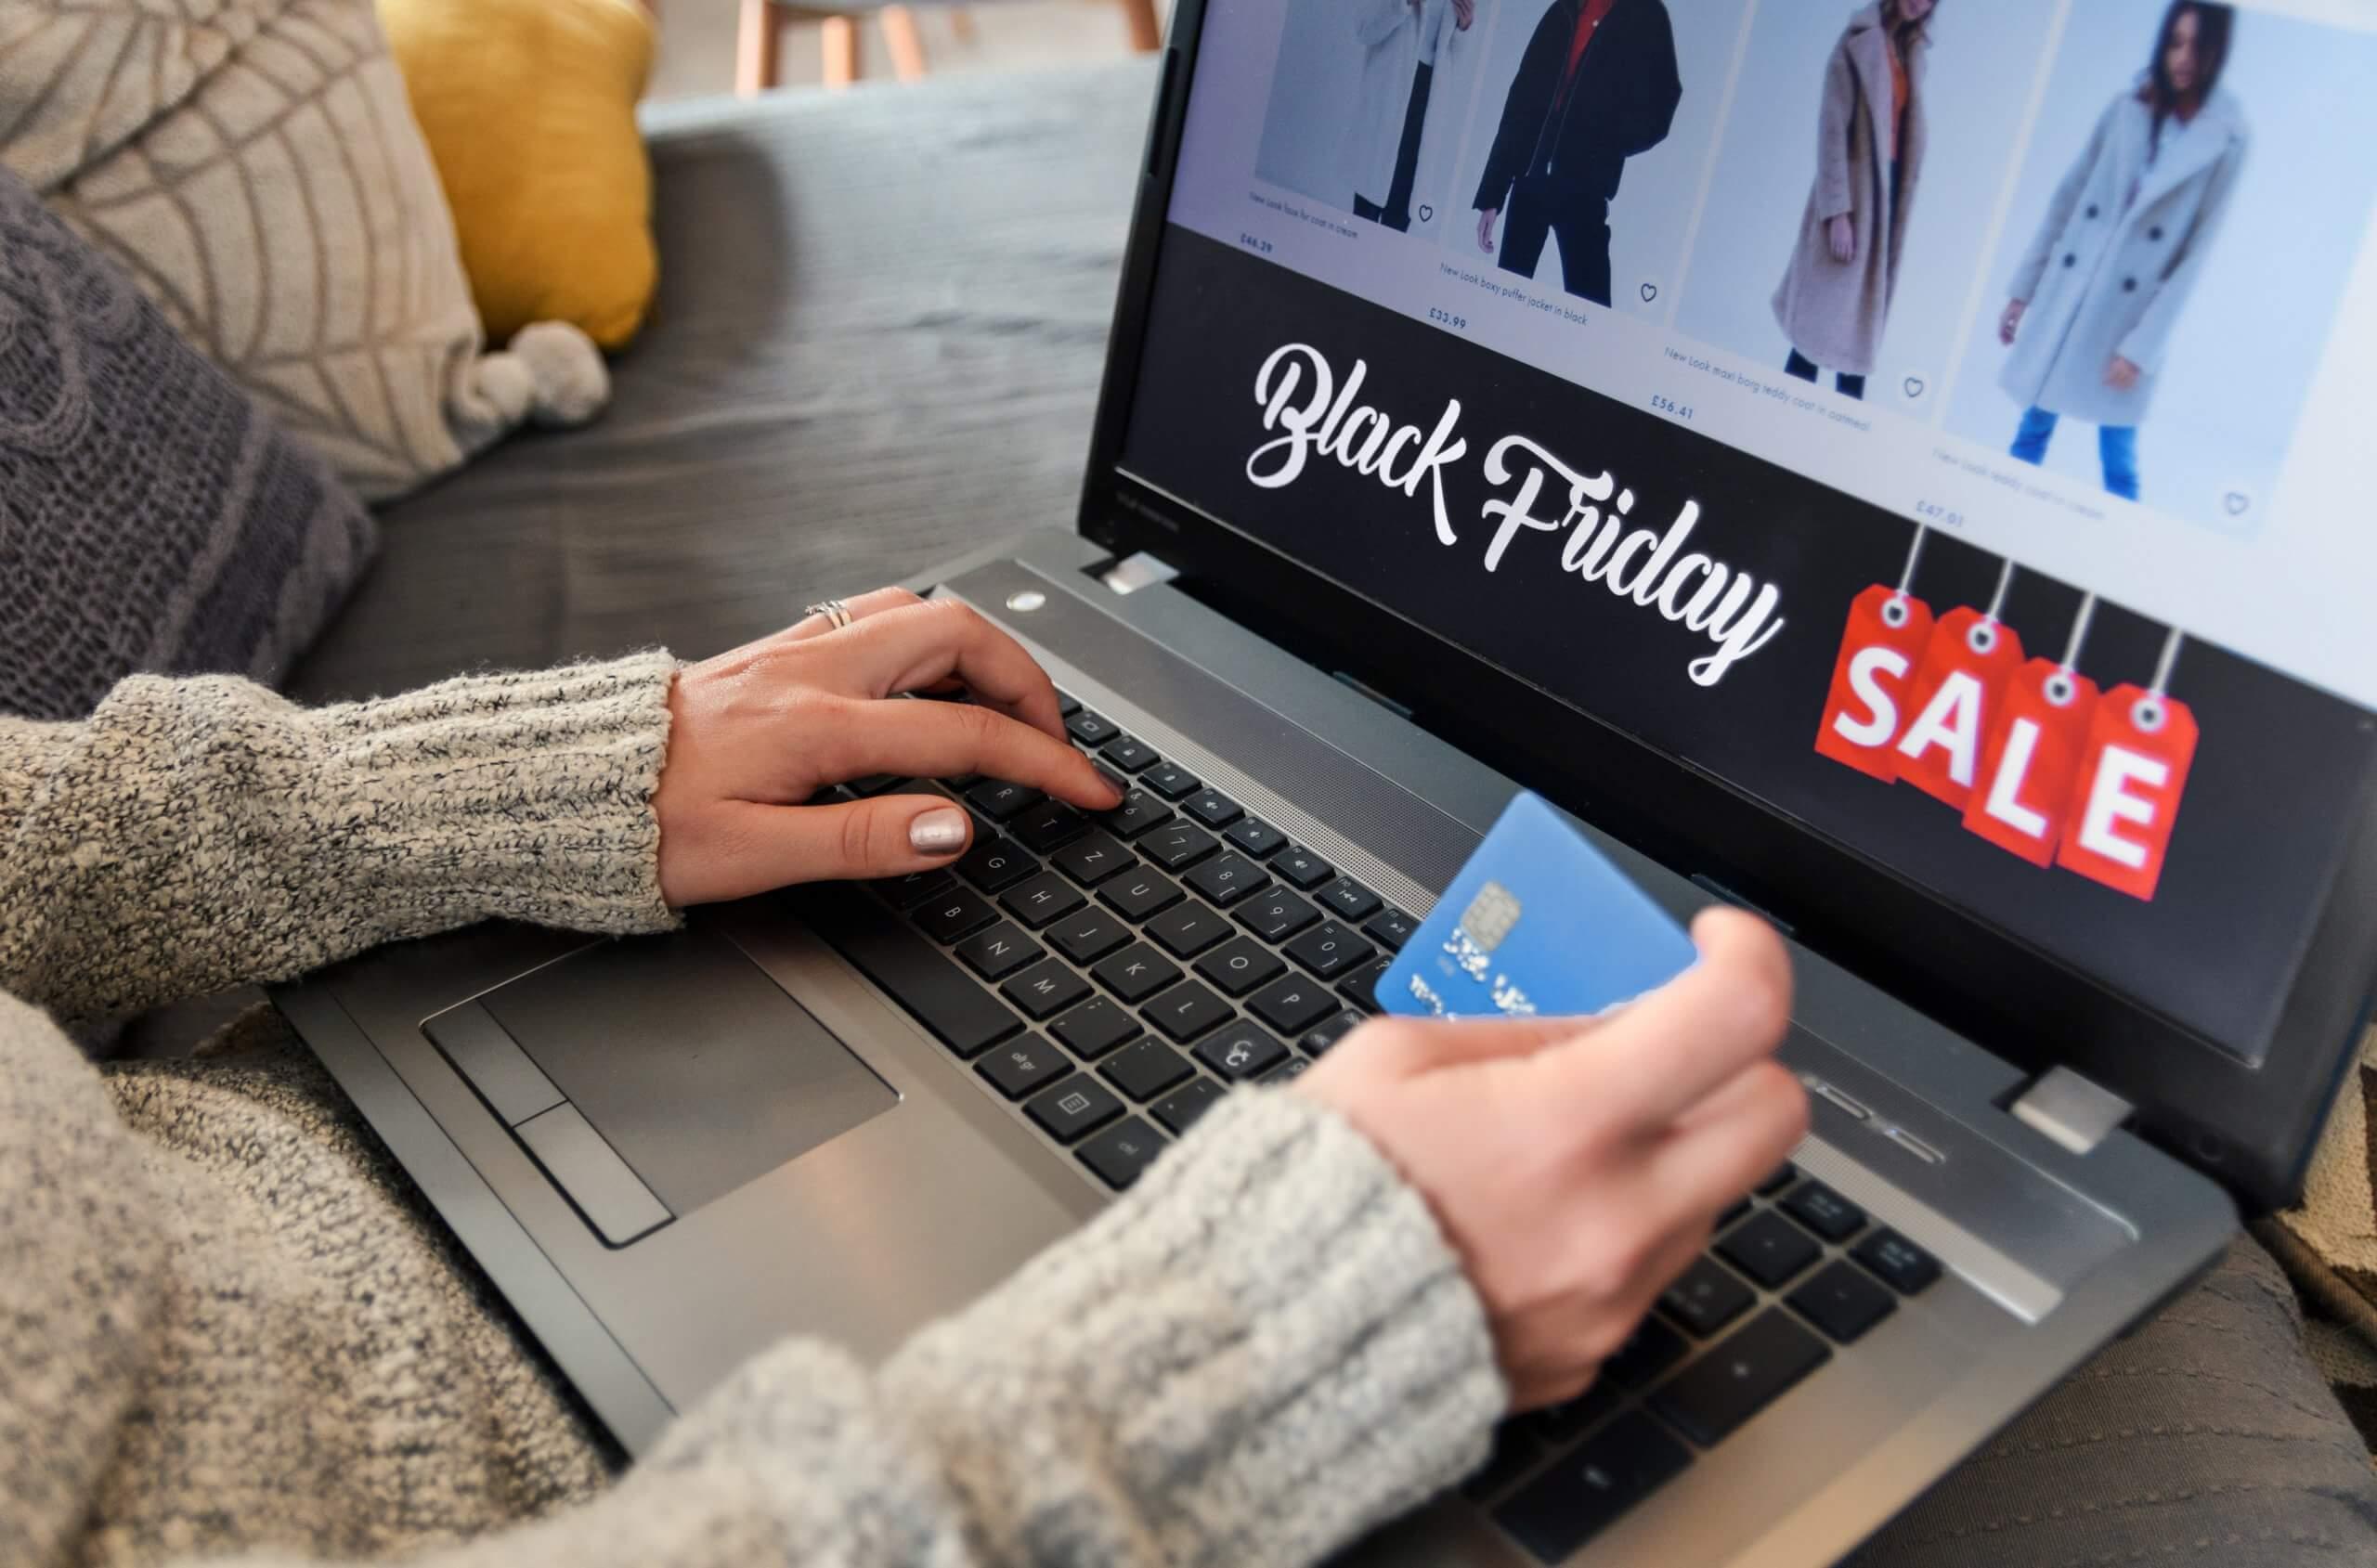 Black Friday Shopping 2021